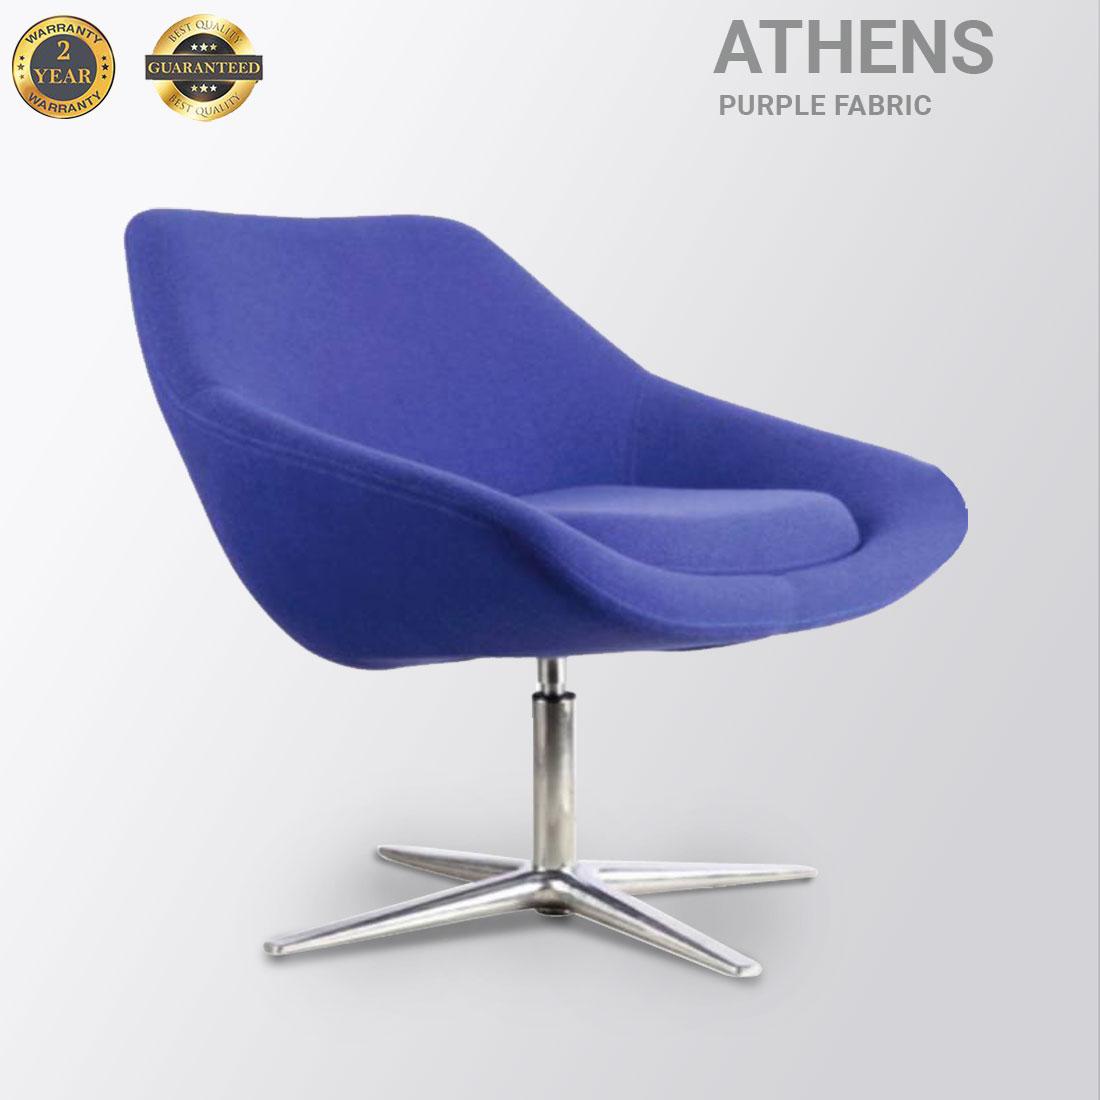 Athens Fabric Purple